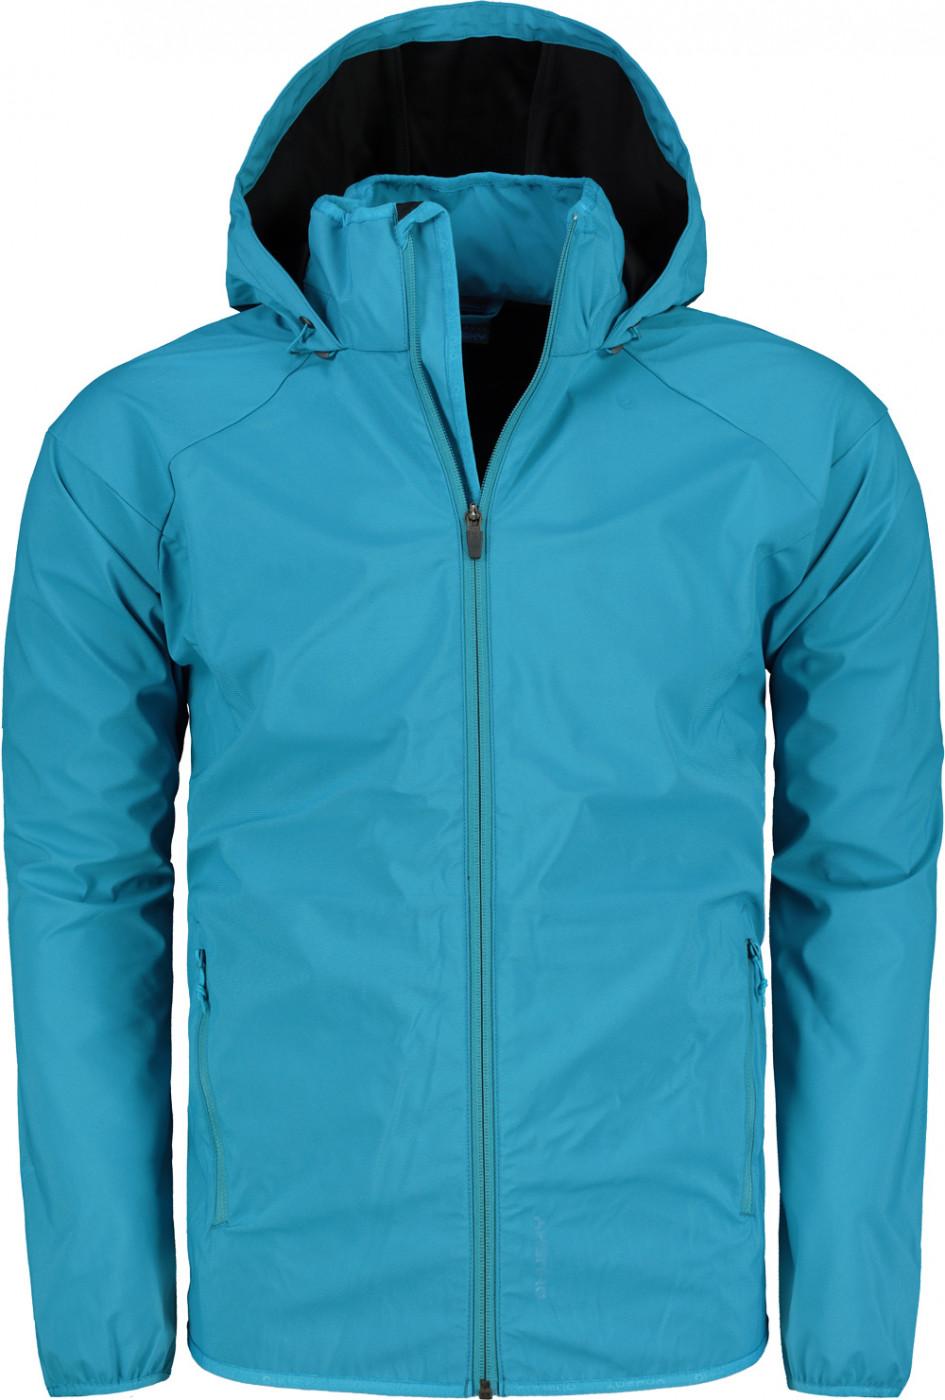 Men's softshell jacket HUSKY SALLY M